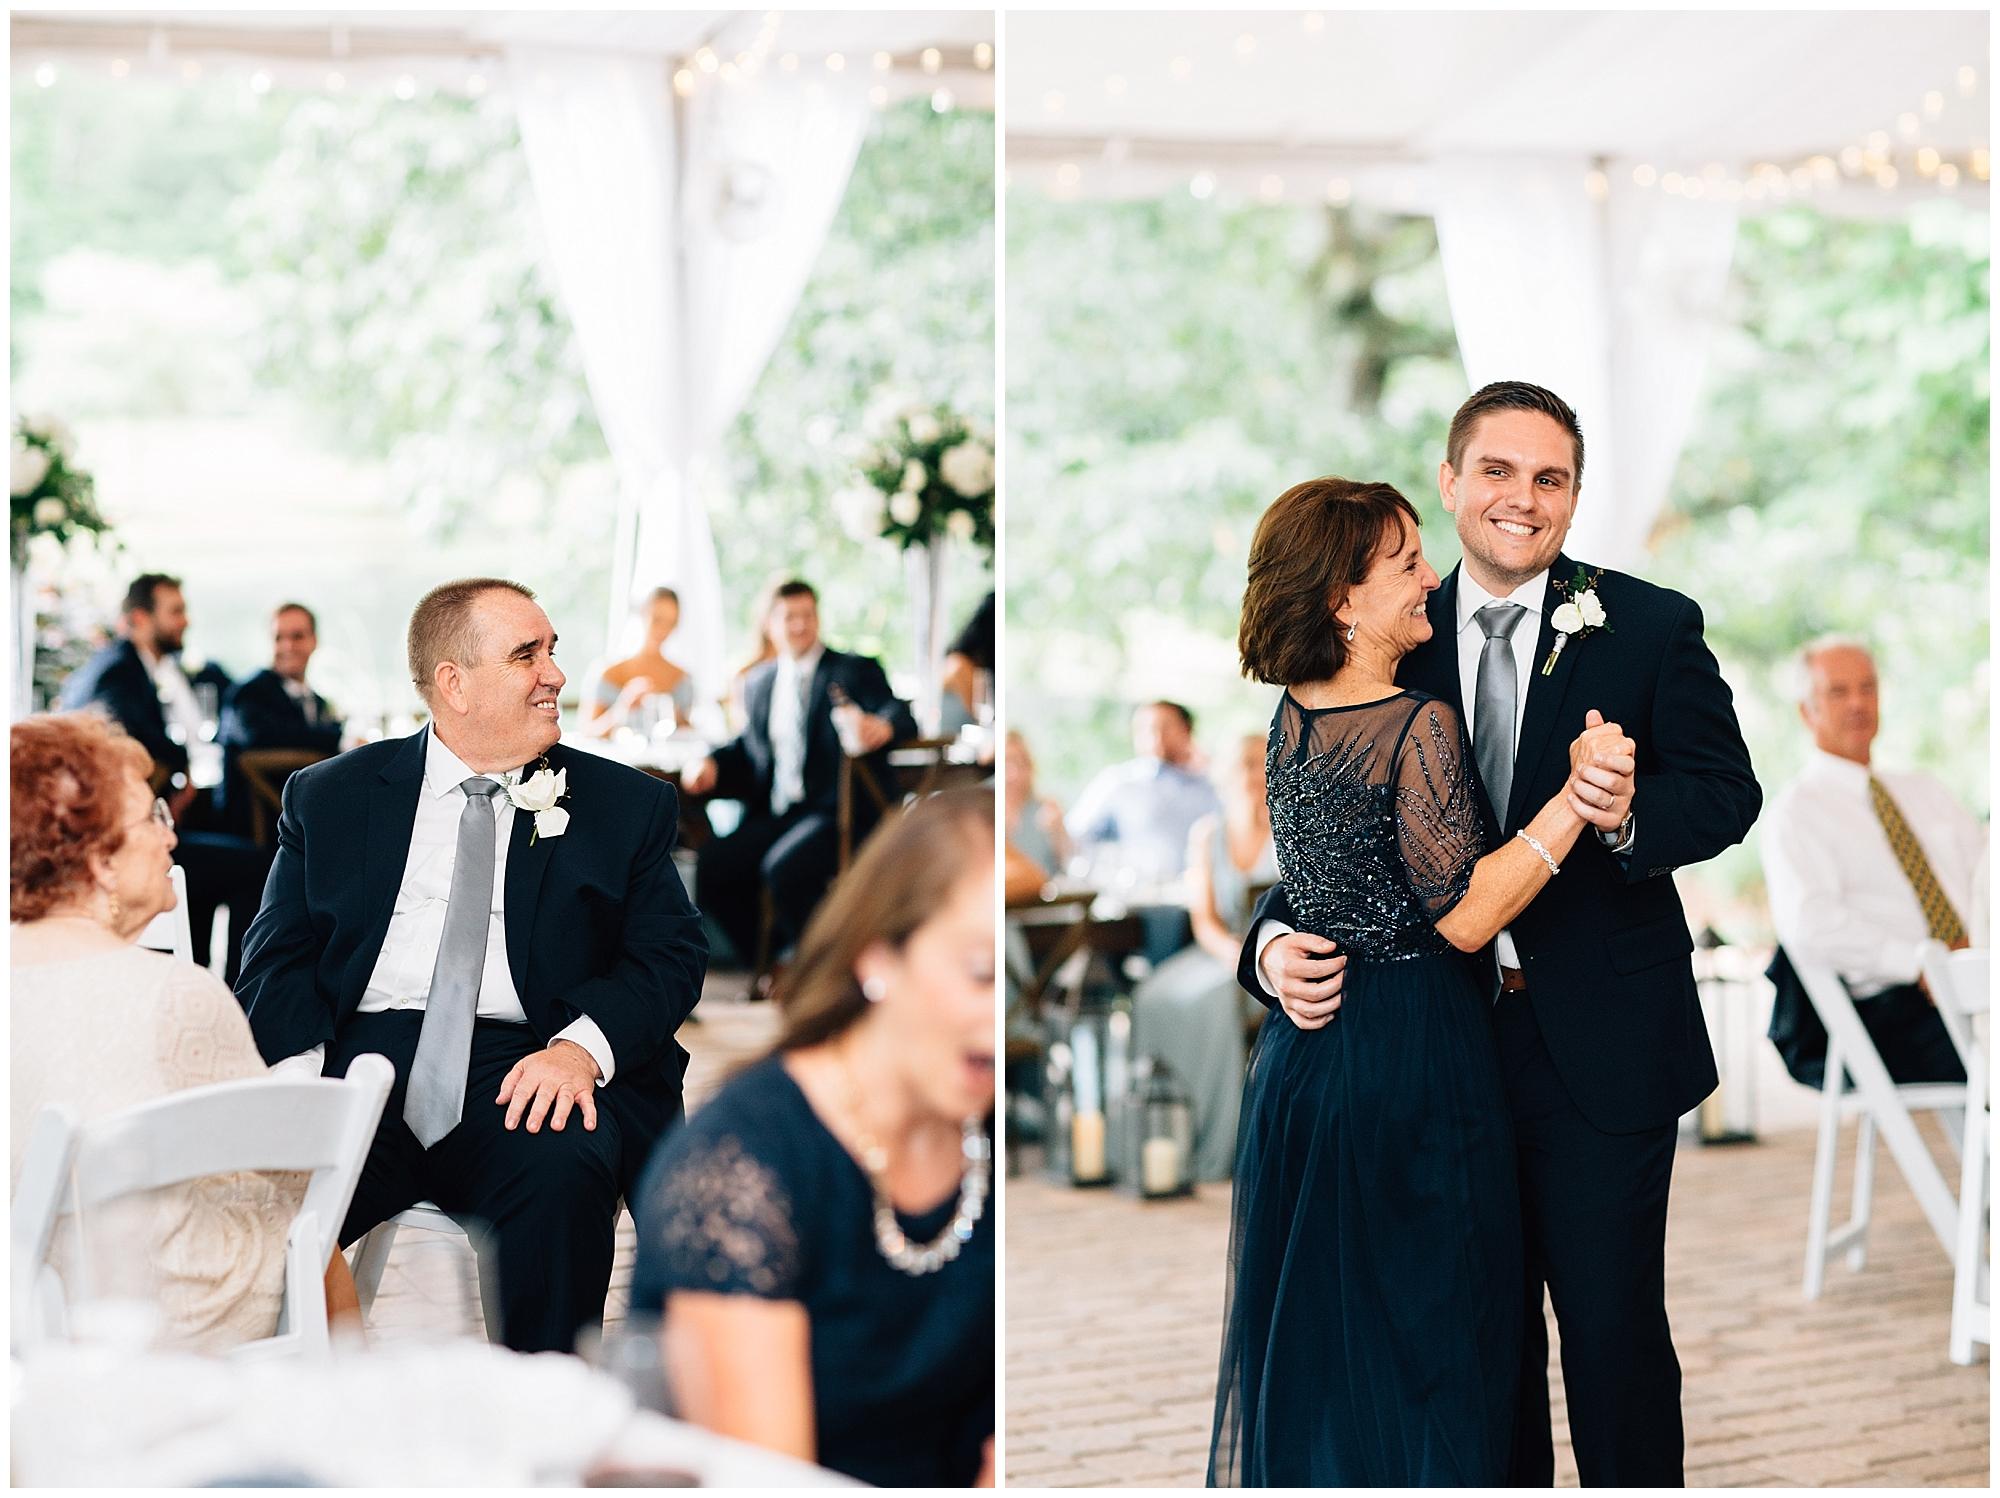 Oaks-at-salem-wedding-apex-photography-94.jpg